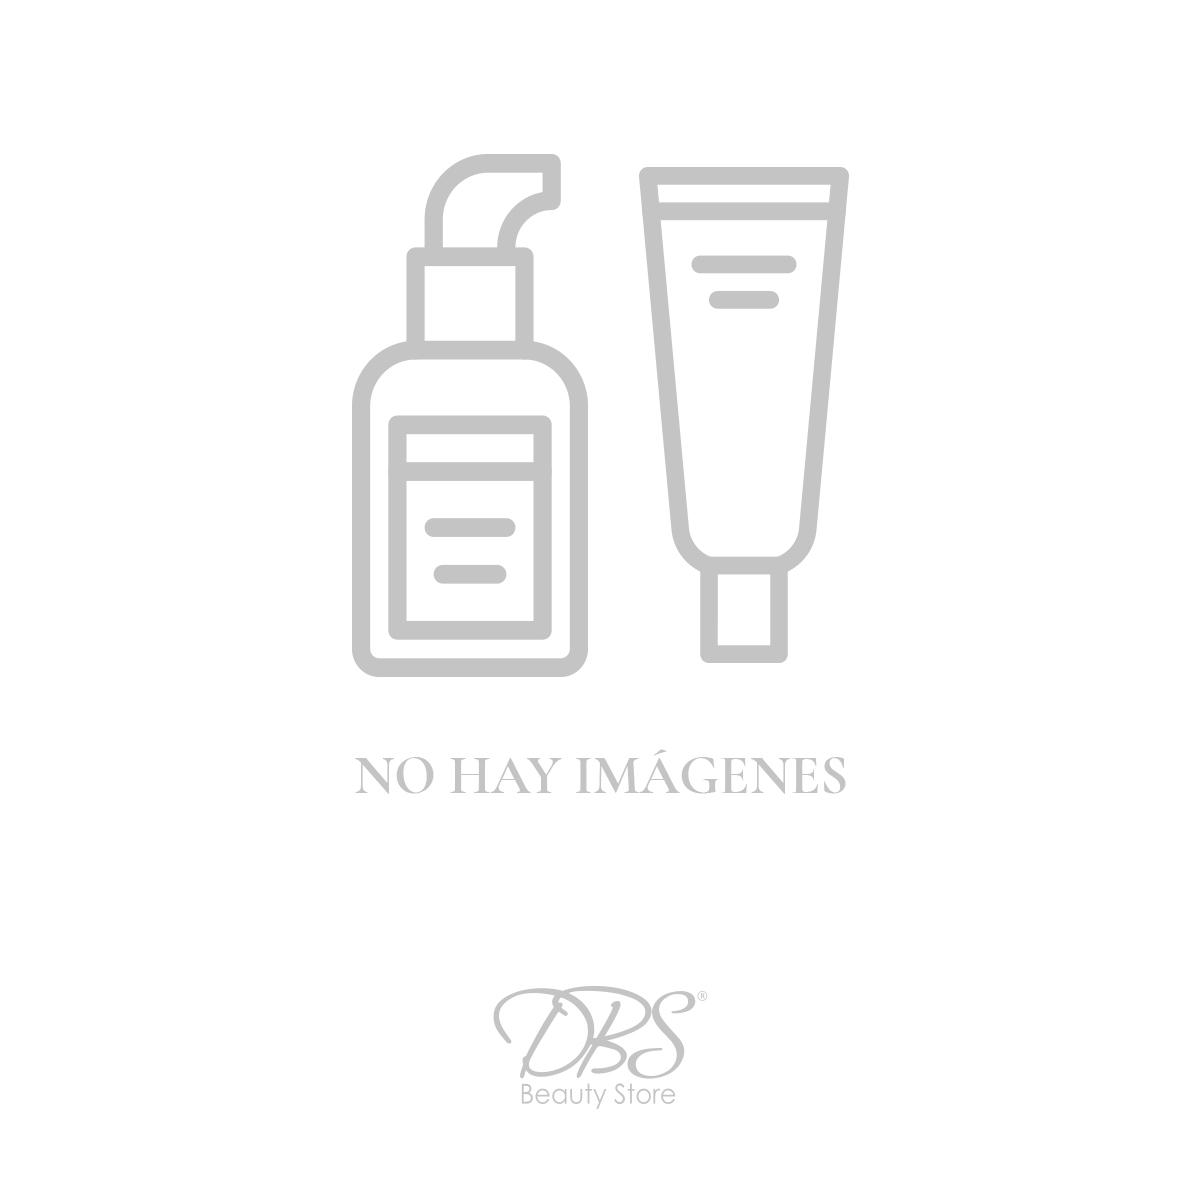 dbs-cosmetics-DBS-CDG5988-MP.jpg